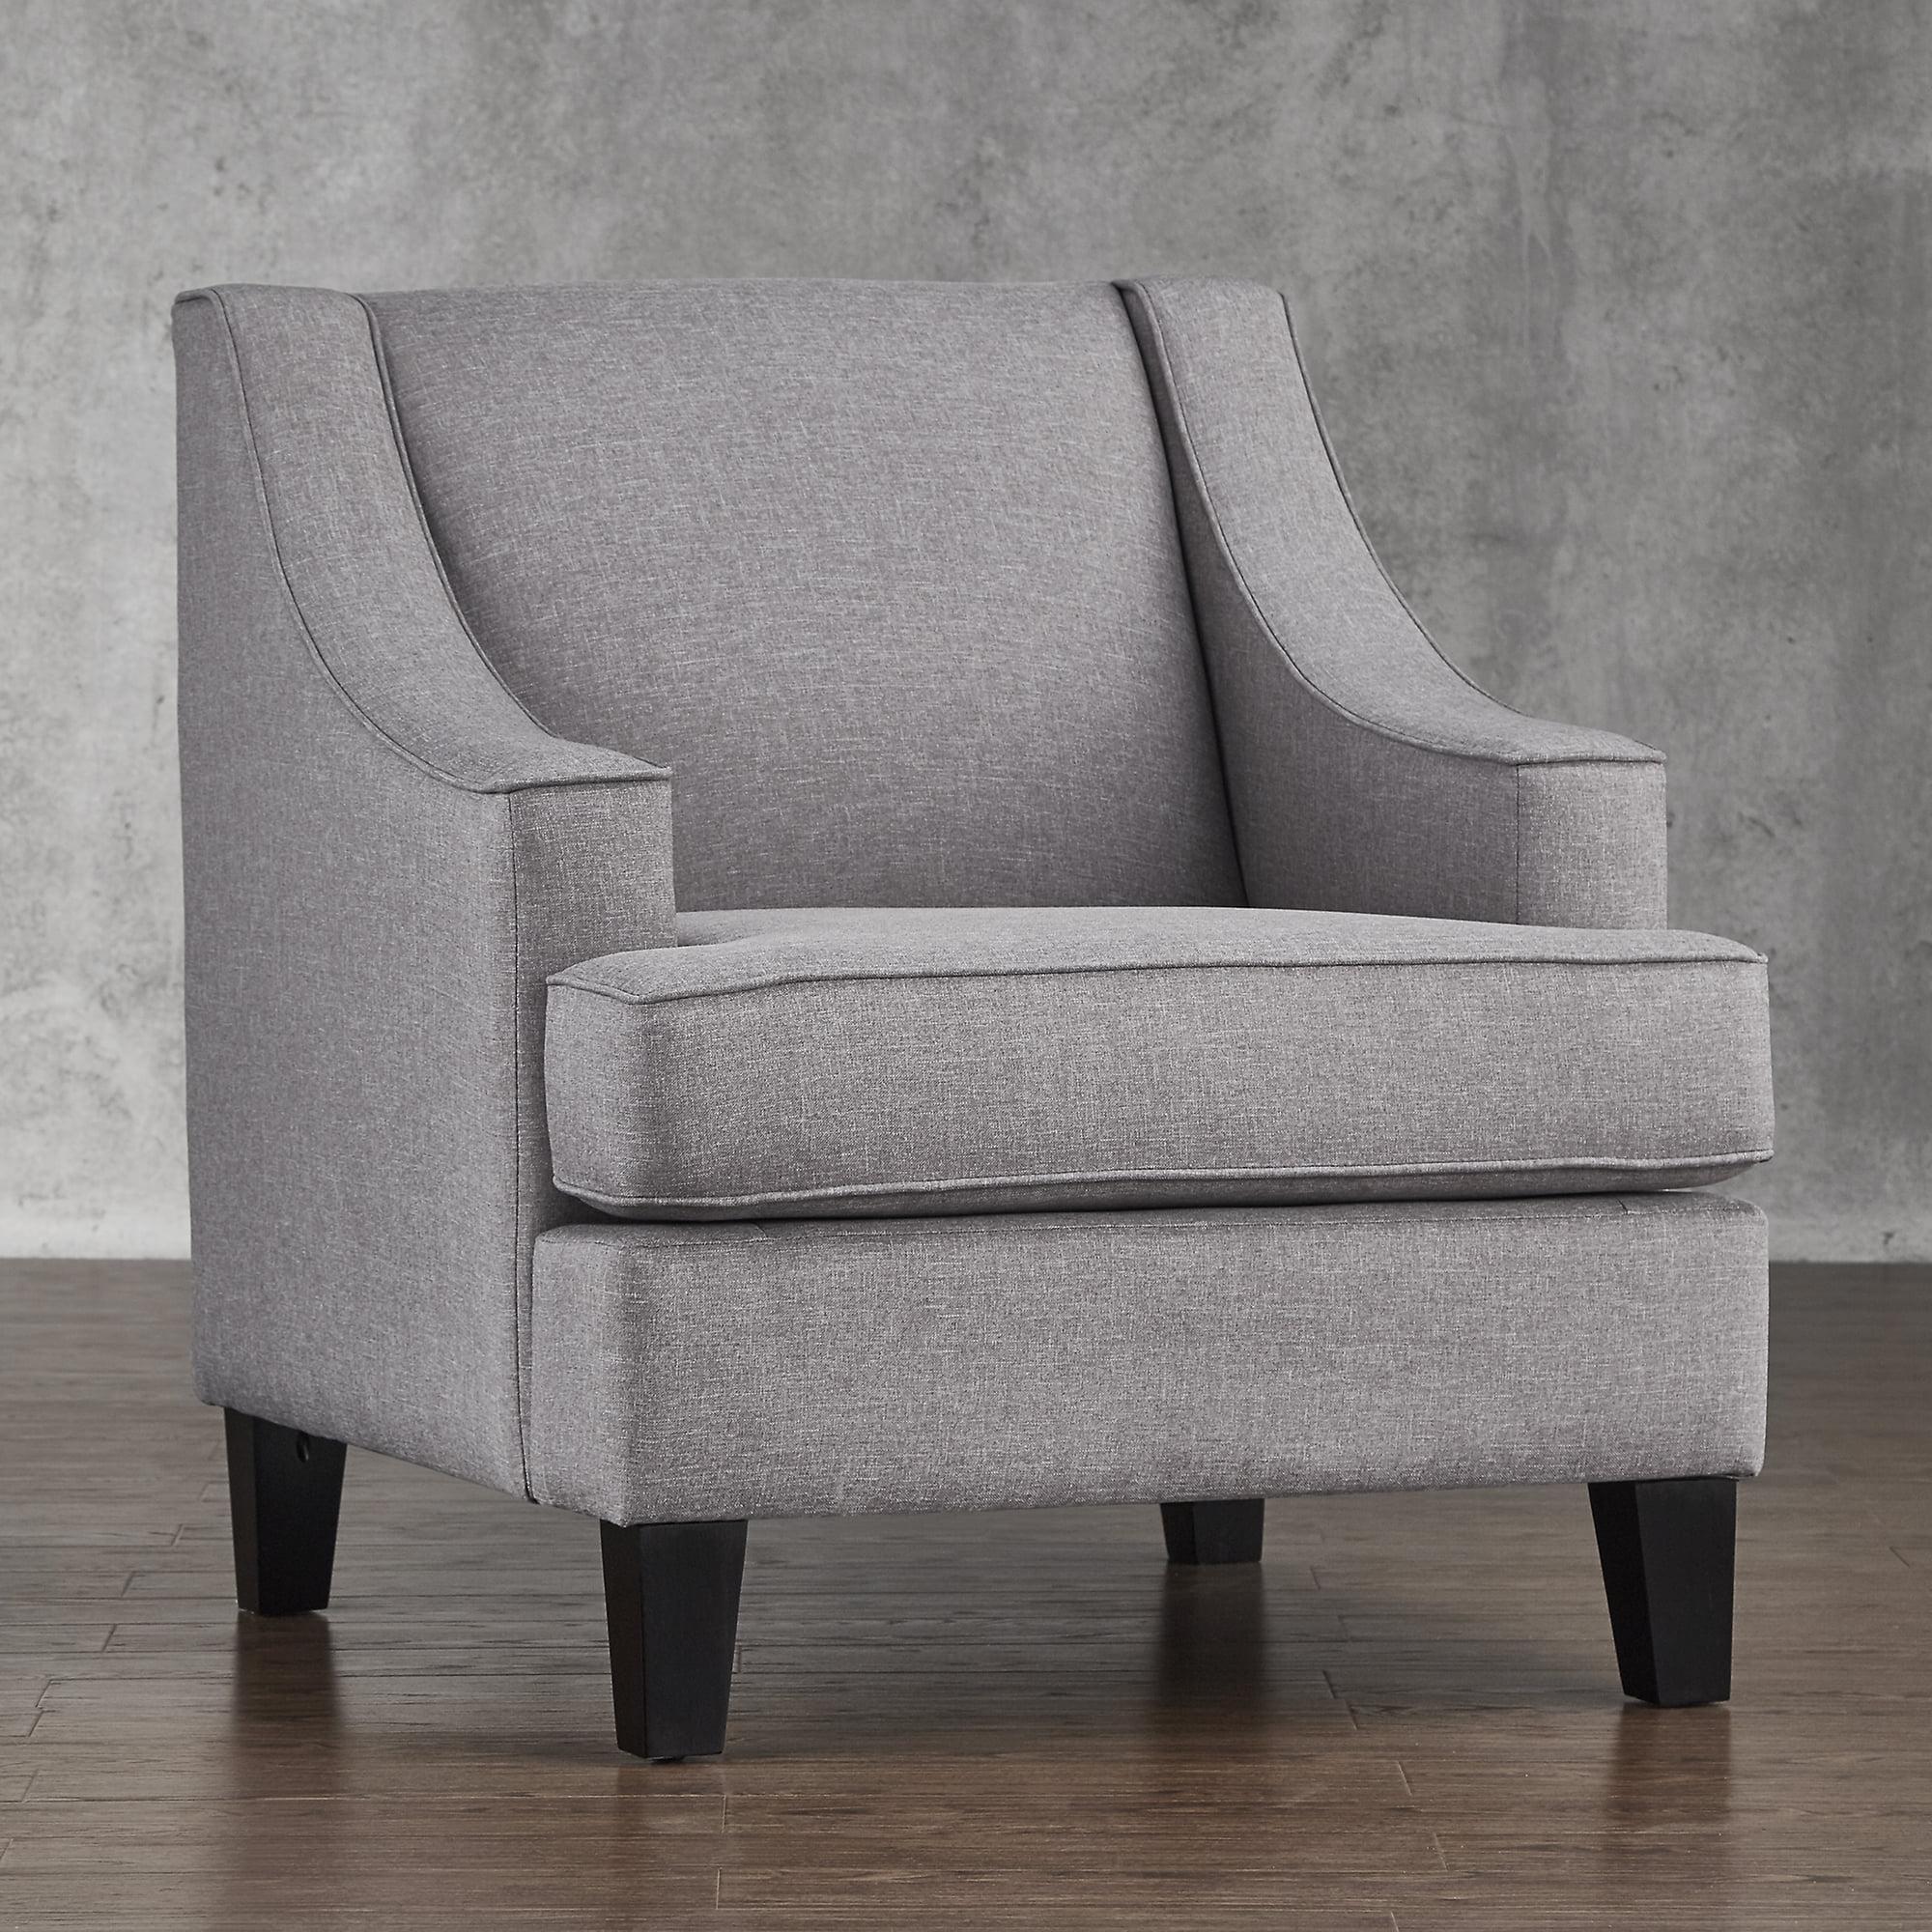 Chelsea Lane Armchair, Gray Linen by Top-Line